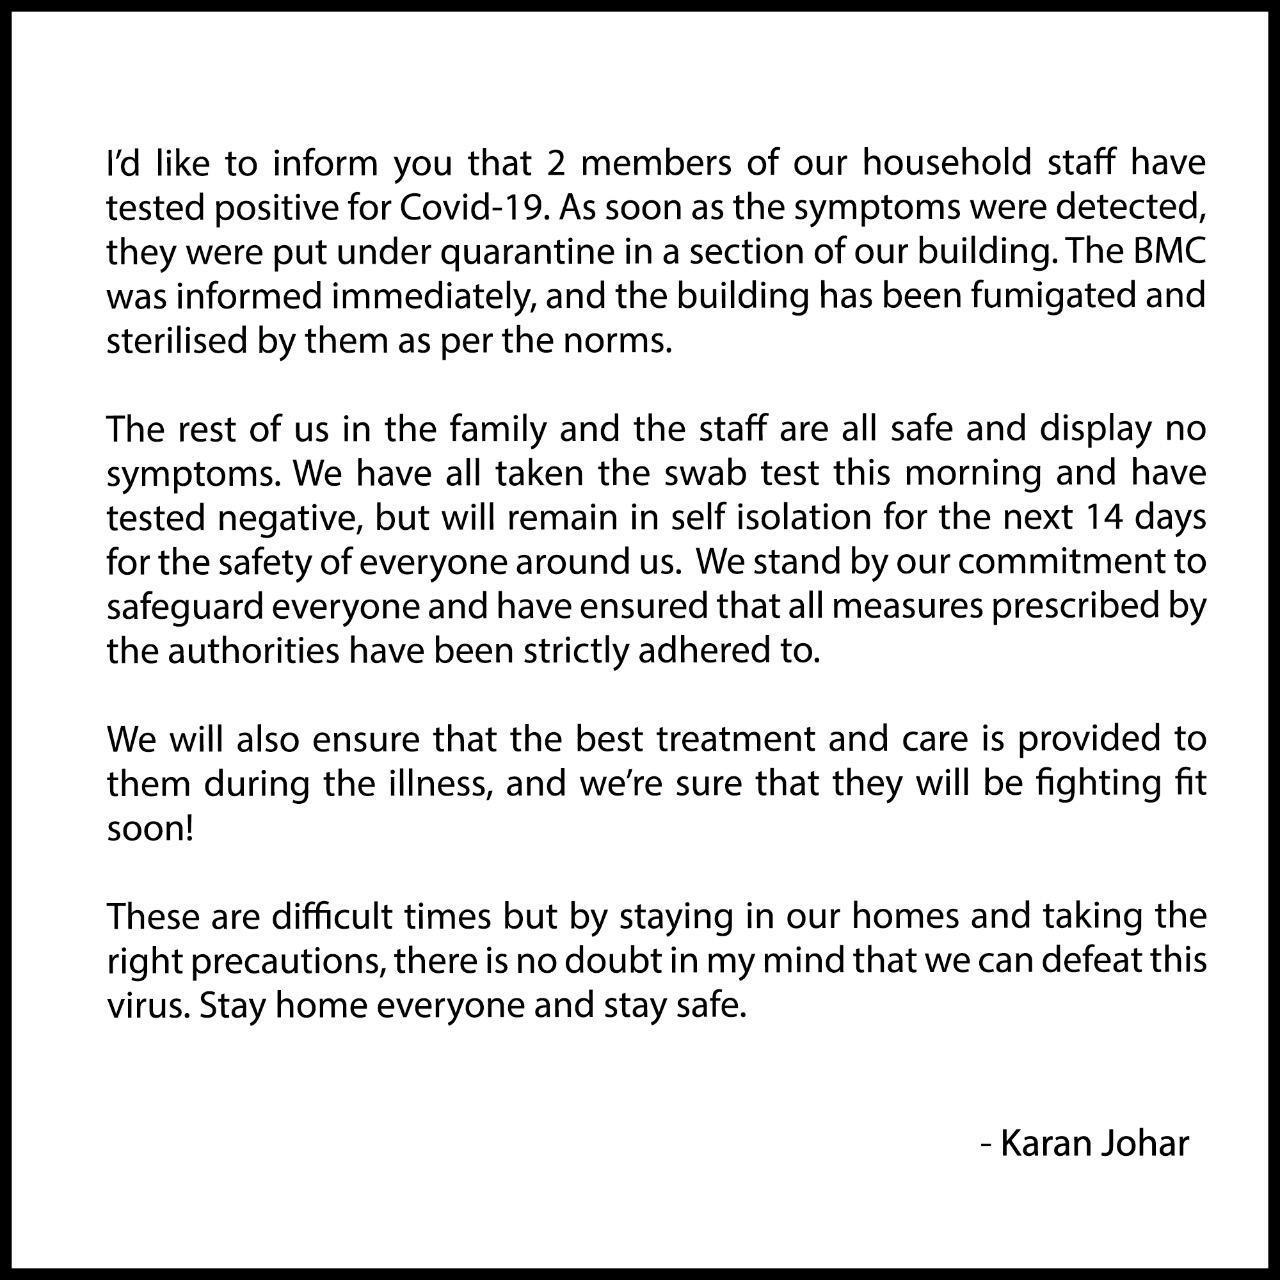 OMG: 2 household staff of Karan Johar now test 'positive' for COVID-19